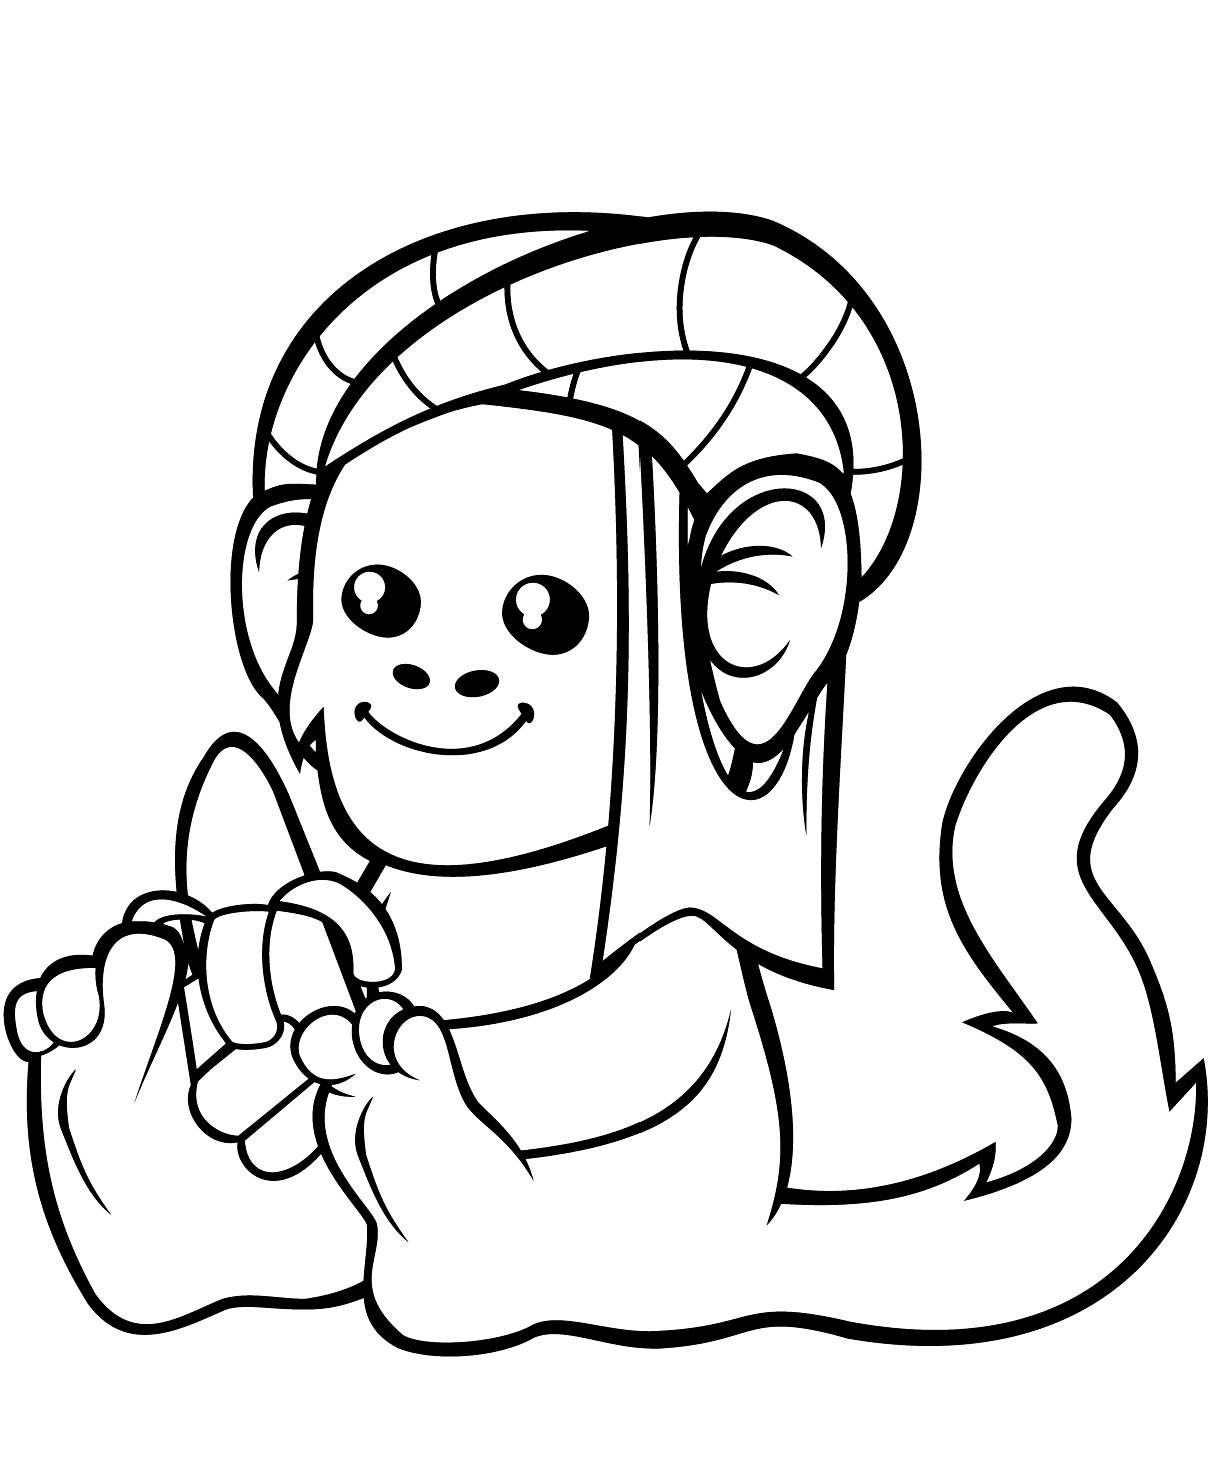 Monkey Enjoying His Banana